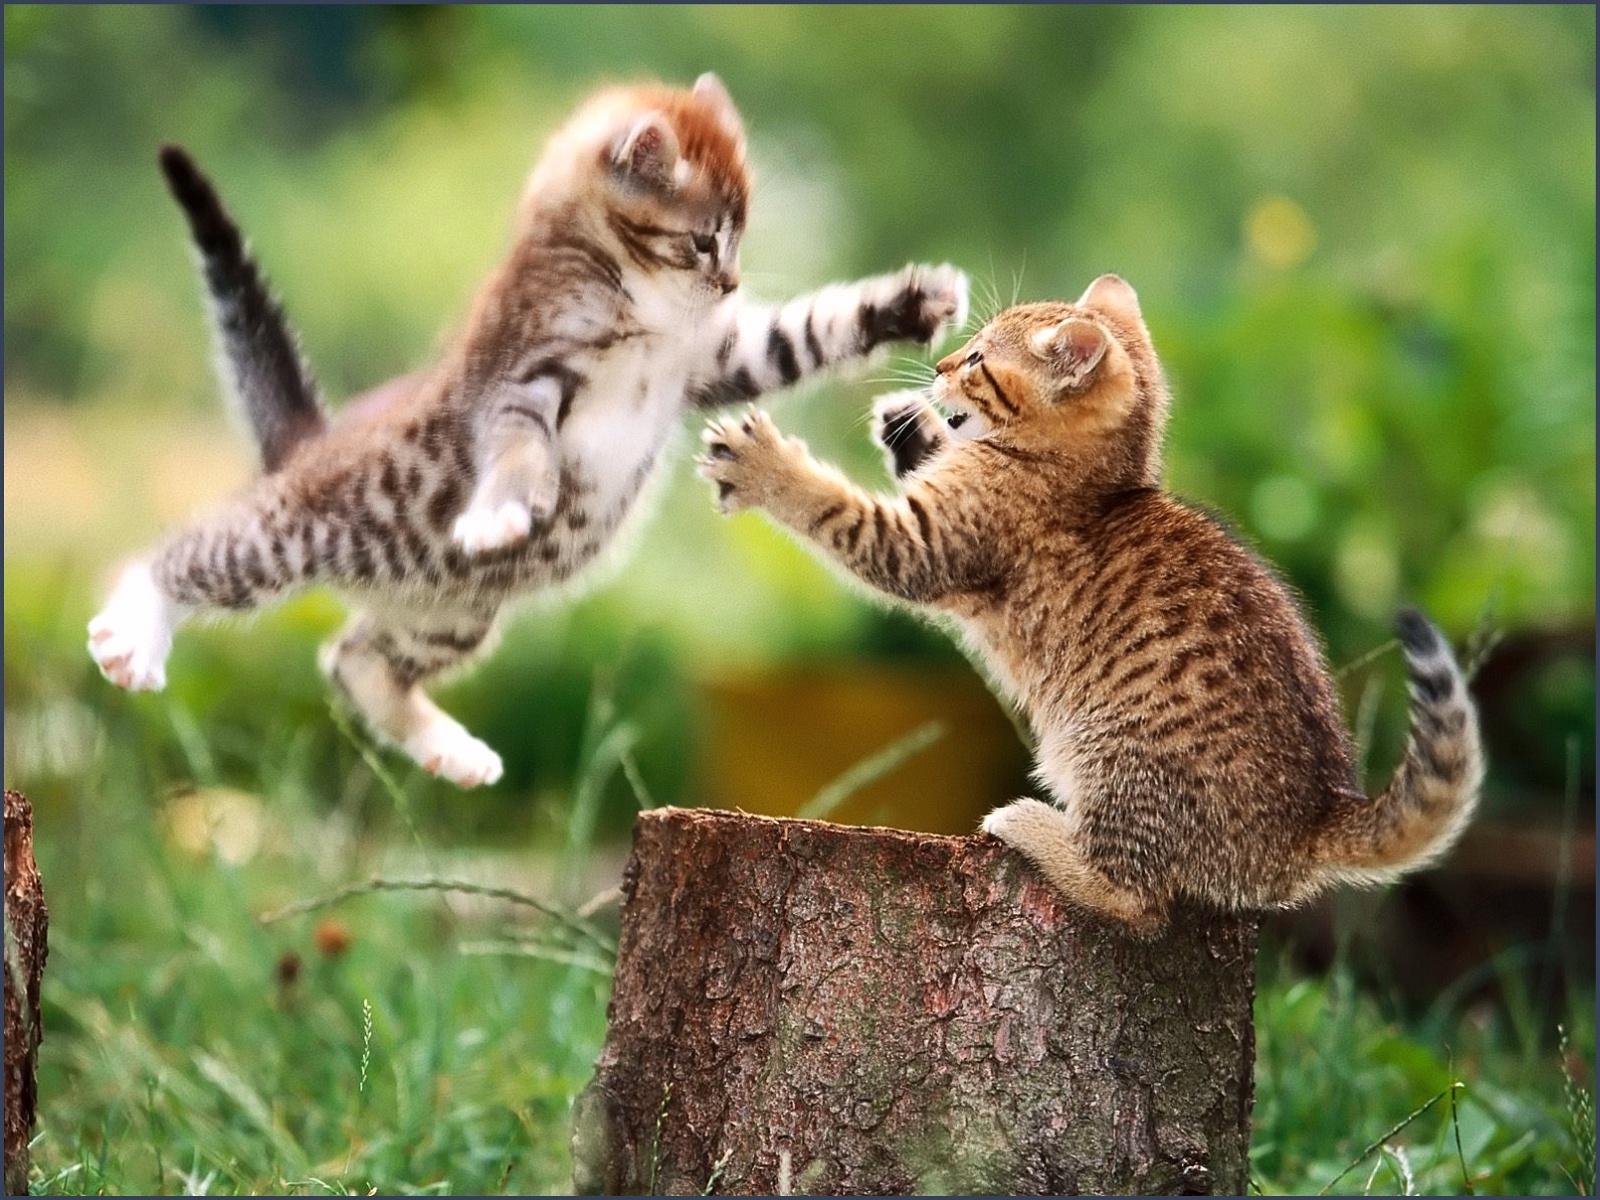 https://4.bp.blogspot.com/-HHGgyi01vlI/Tn6juVxafkI/AAAAAAAACWs/IogIWAdhVrQ/s1600/994-animals_cat_cats_wallpaper.jpg